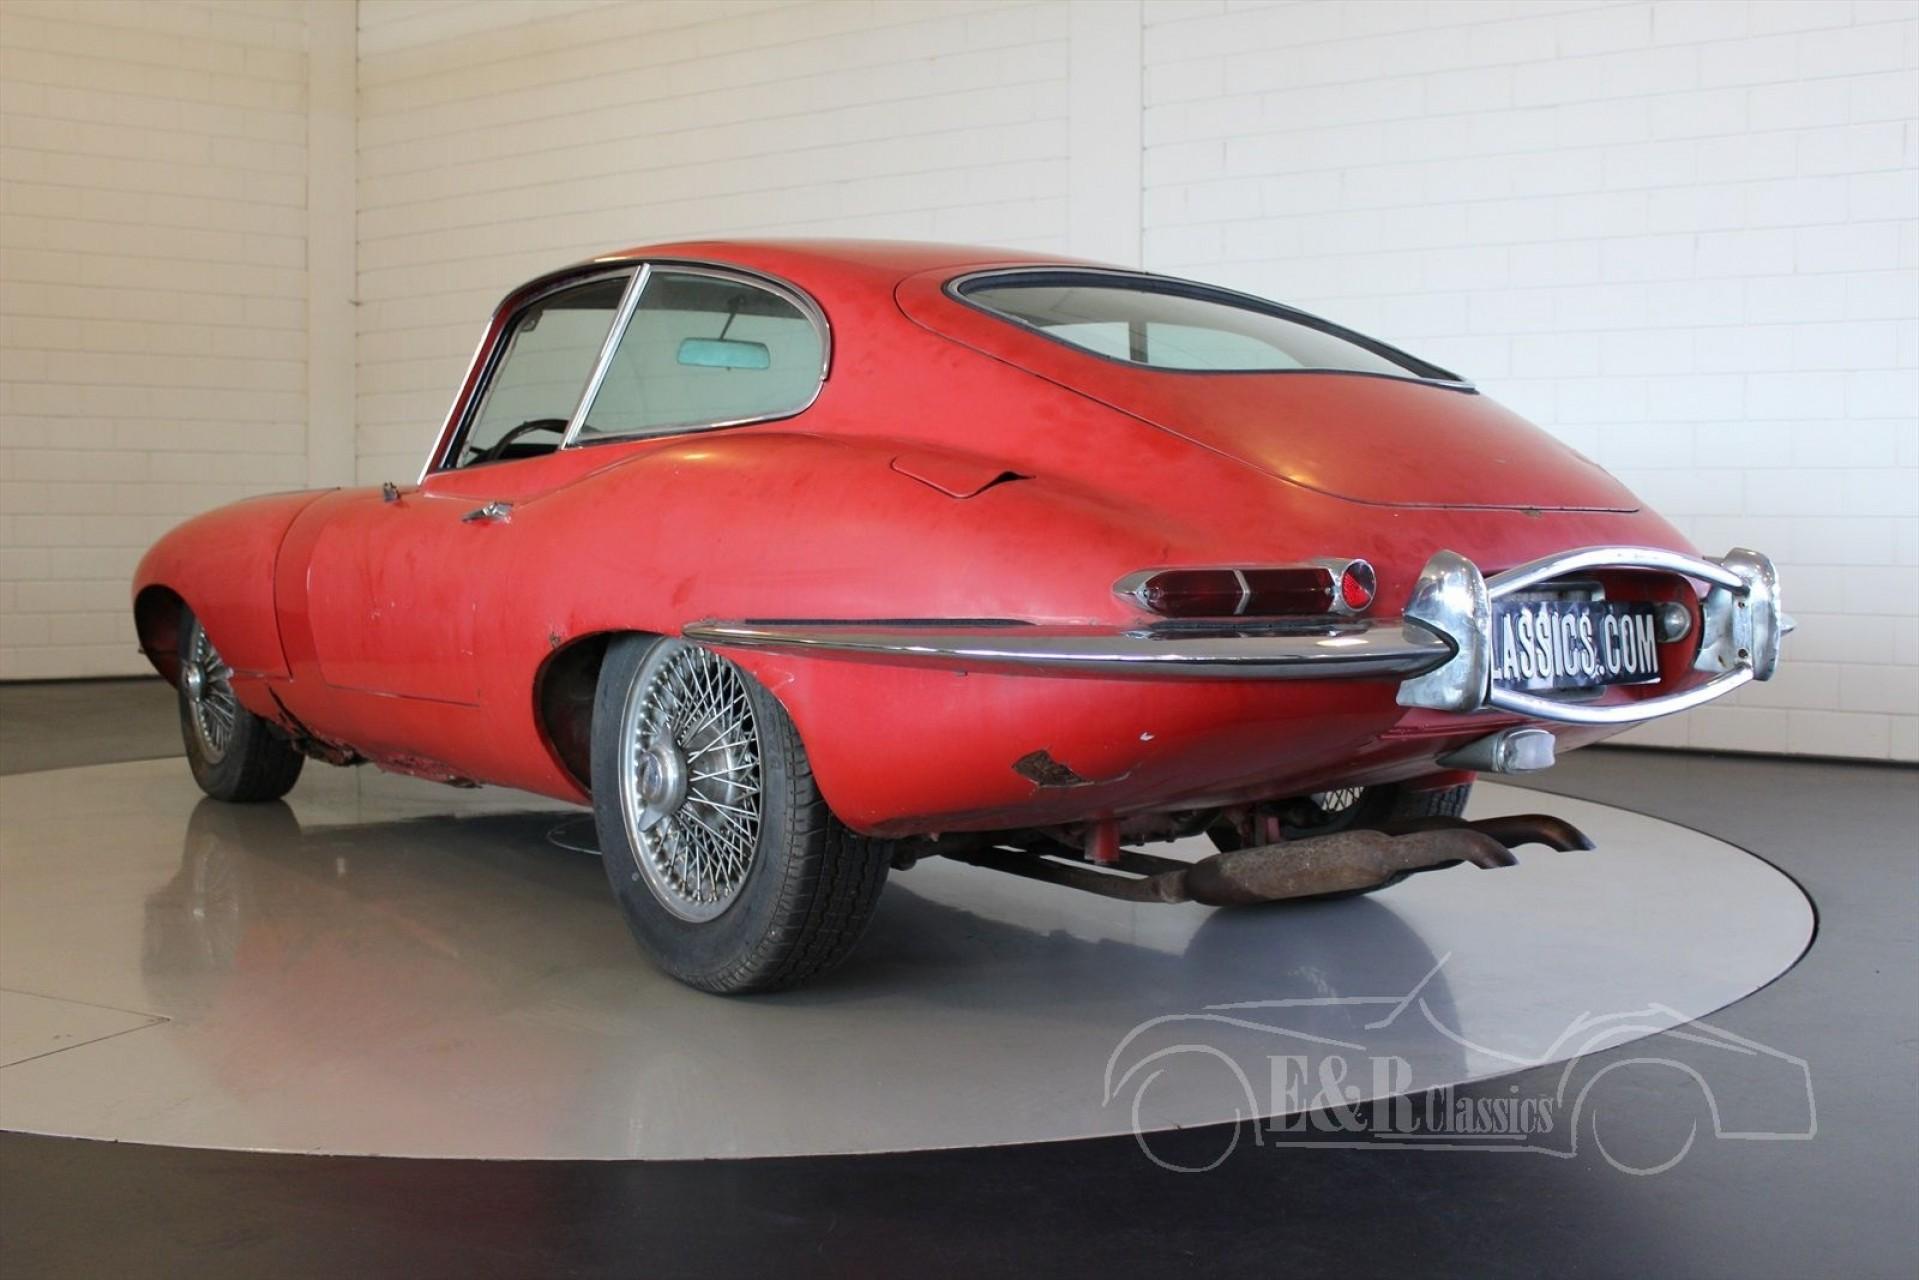 jaguar e type series 1 coupe 1962 vendre erclassics. Black Bedroom Furniture Sets. Home Design Ideas